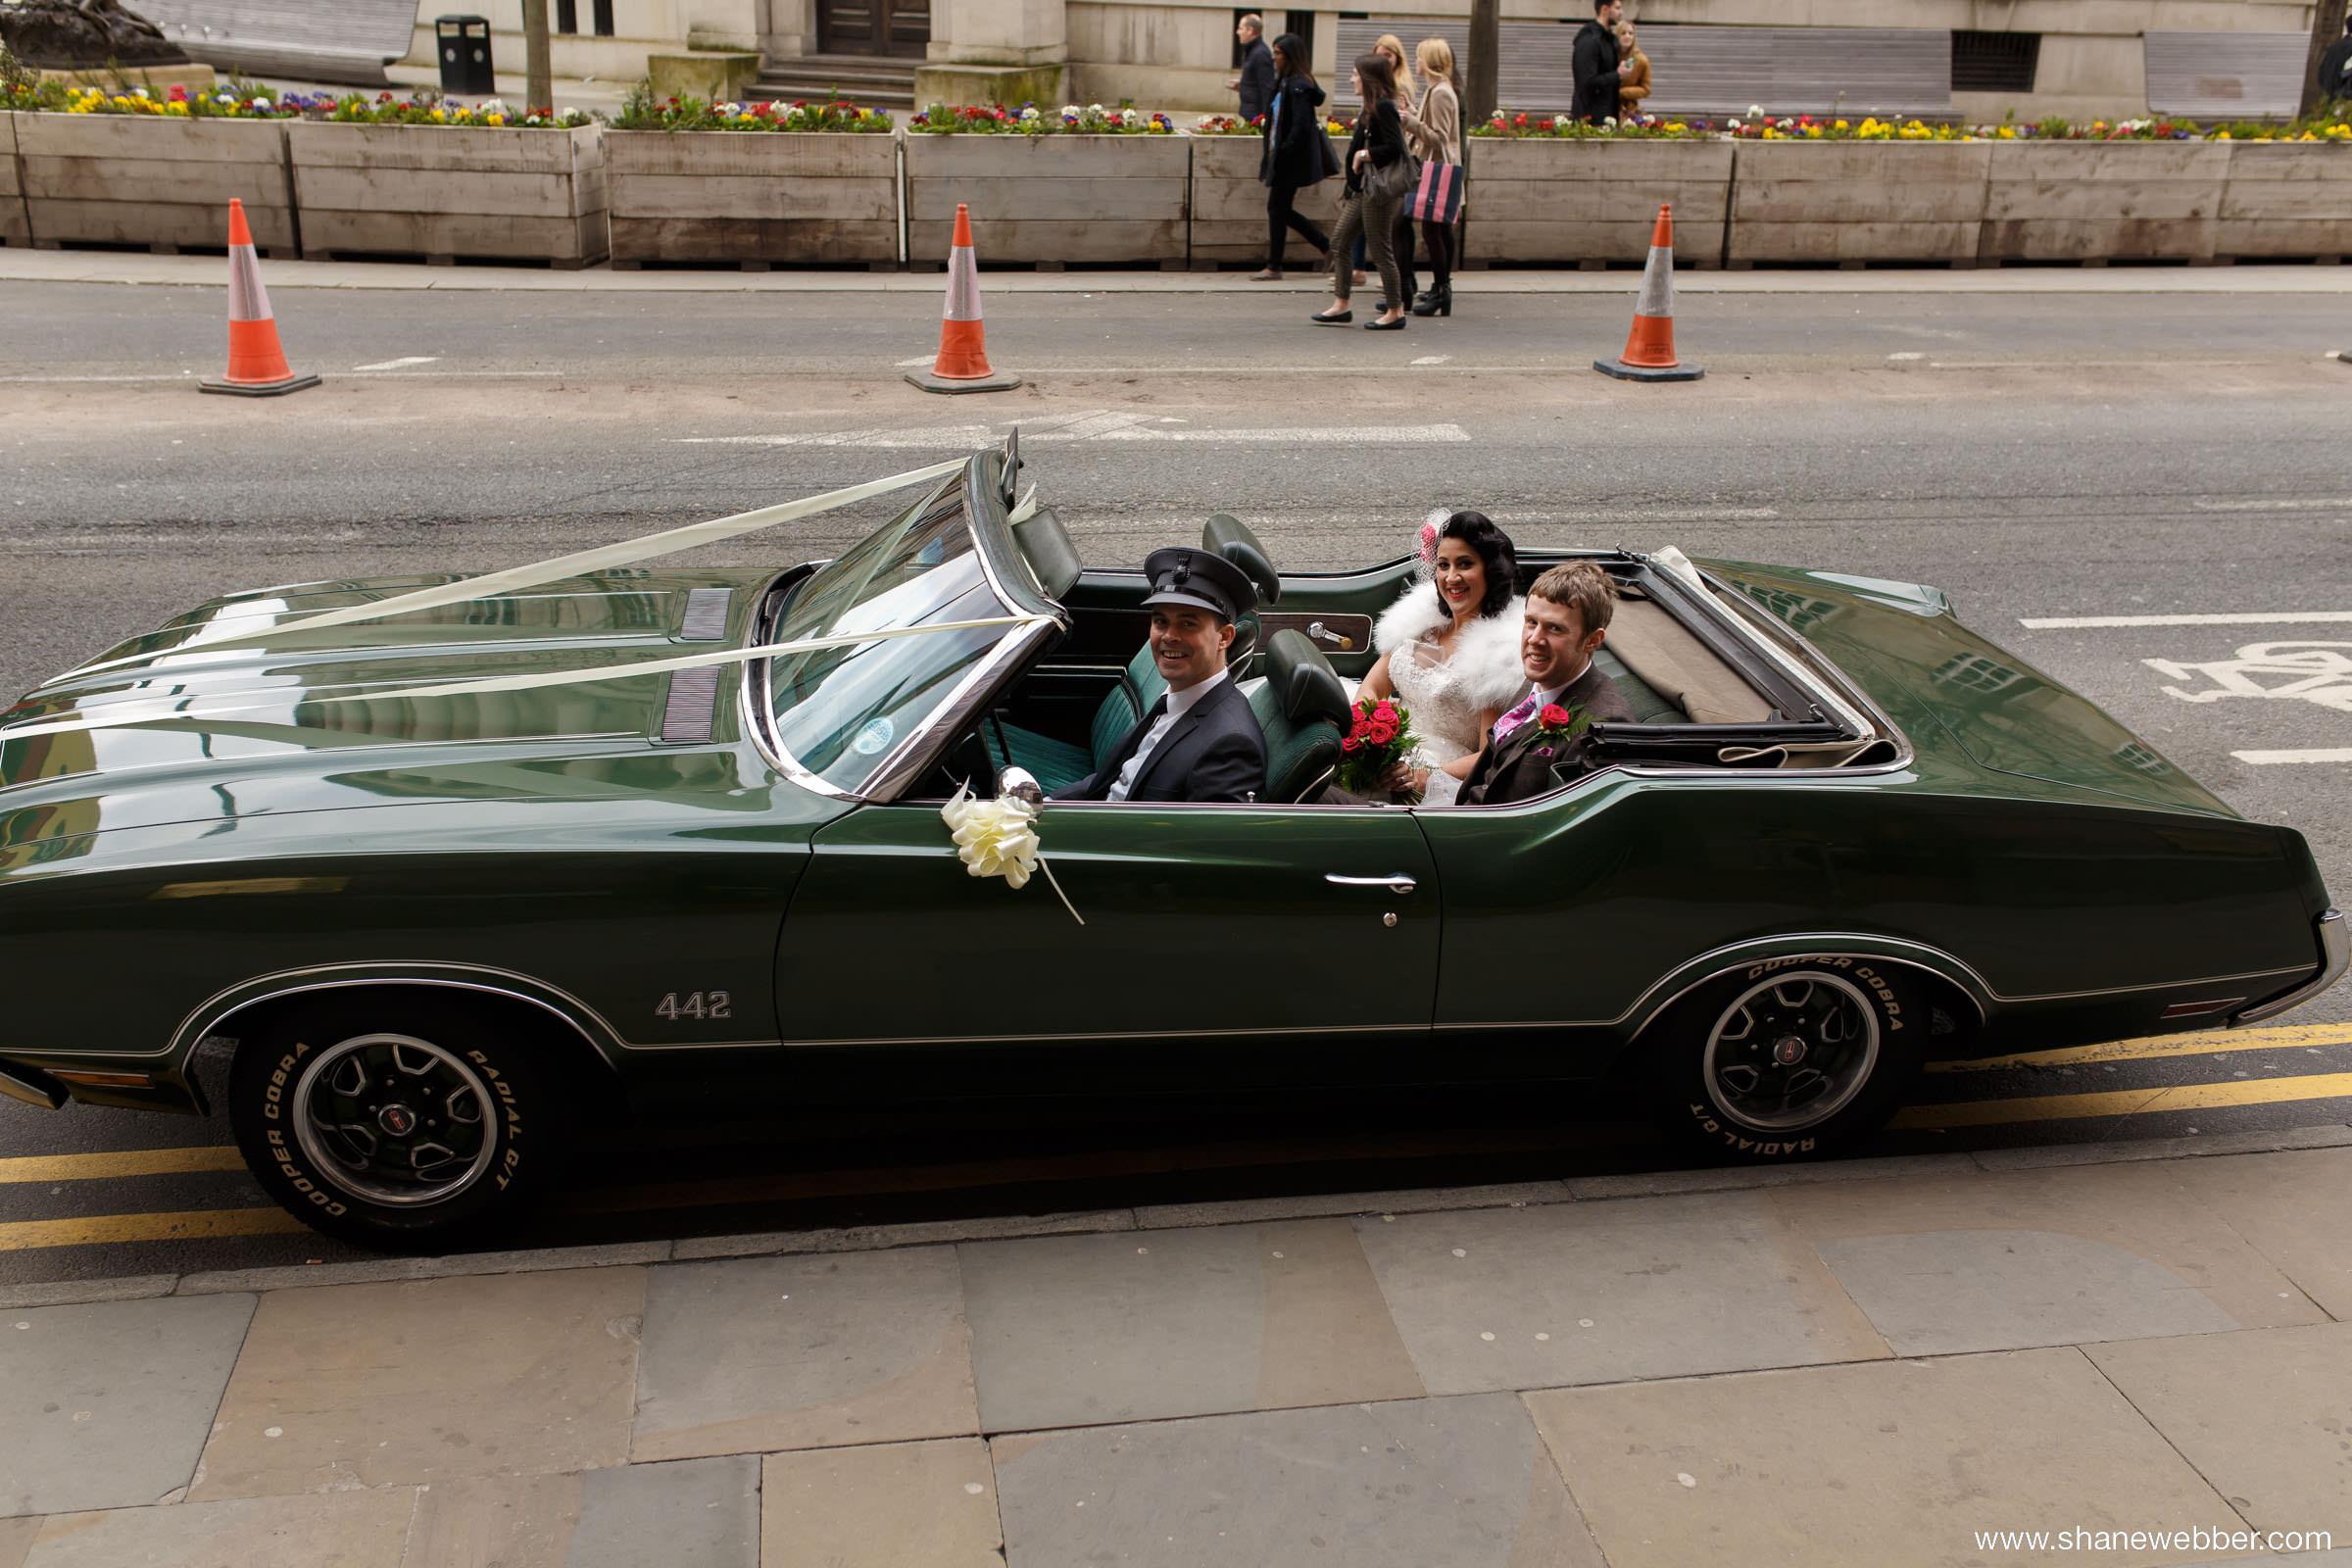 Green vintage wedding car